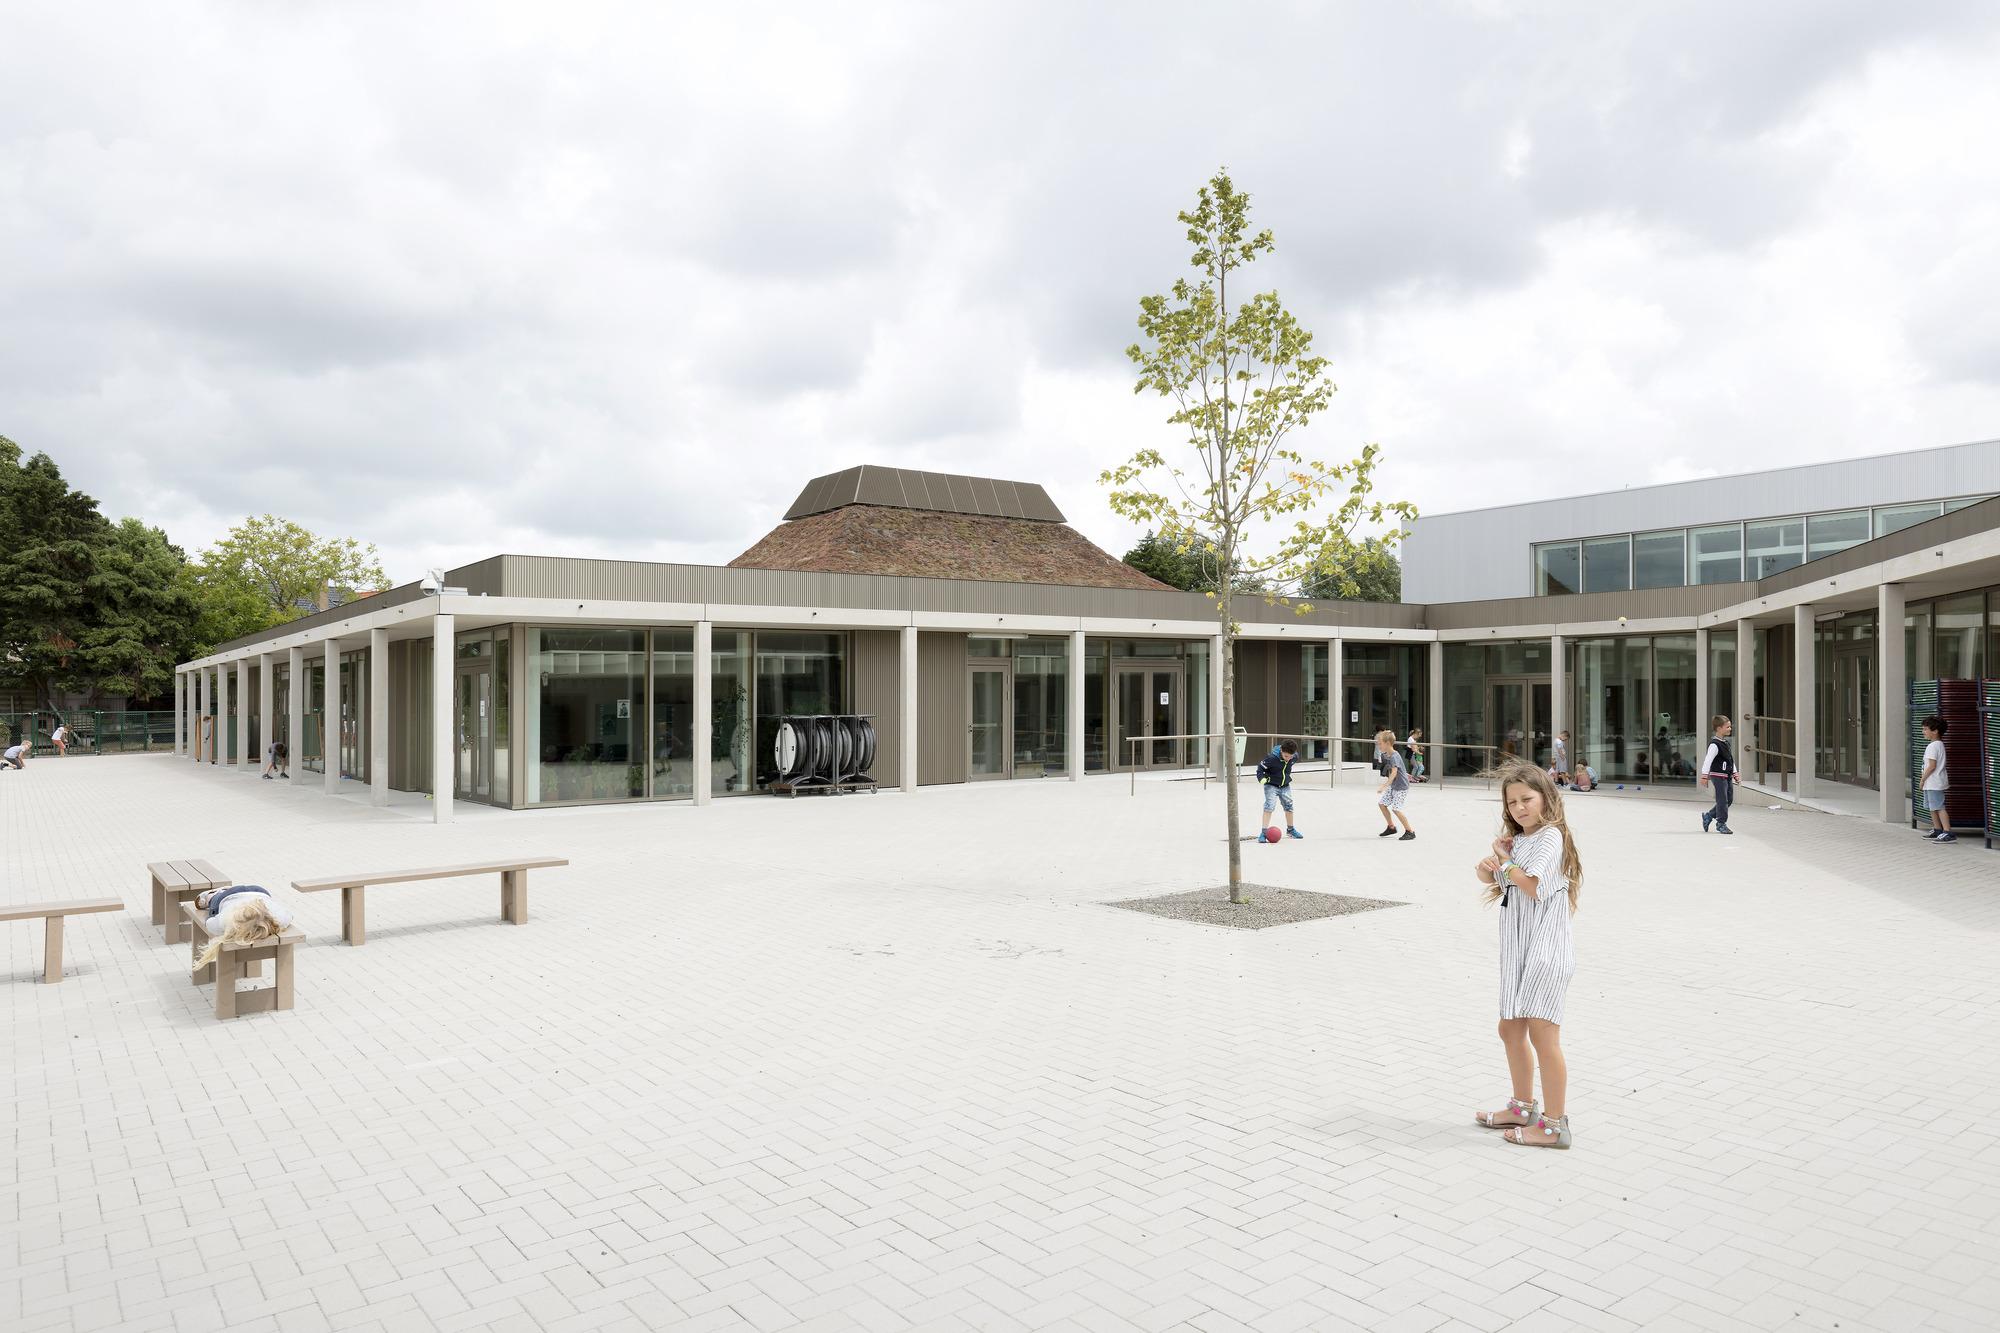 Schools Architecture And Design ArchDaily - Schools architecture